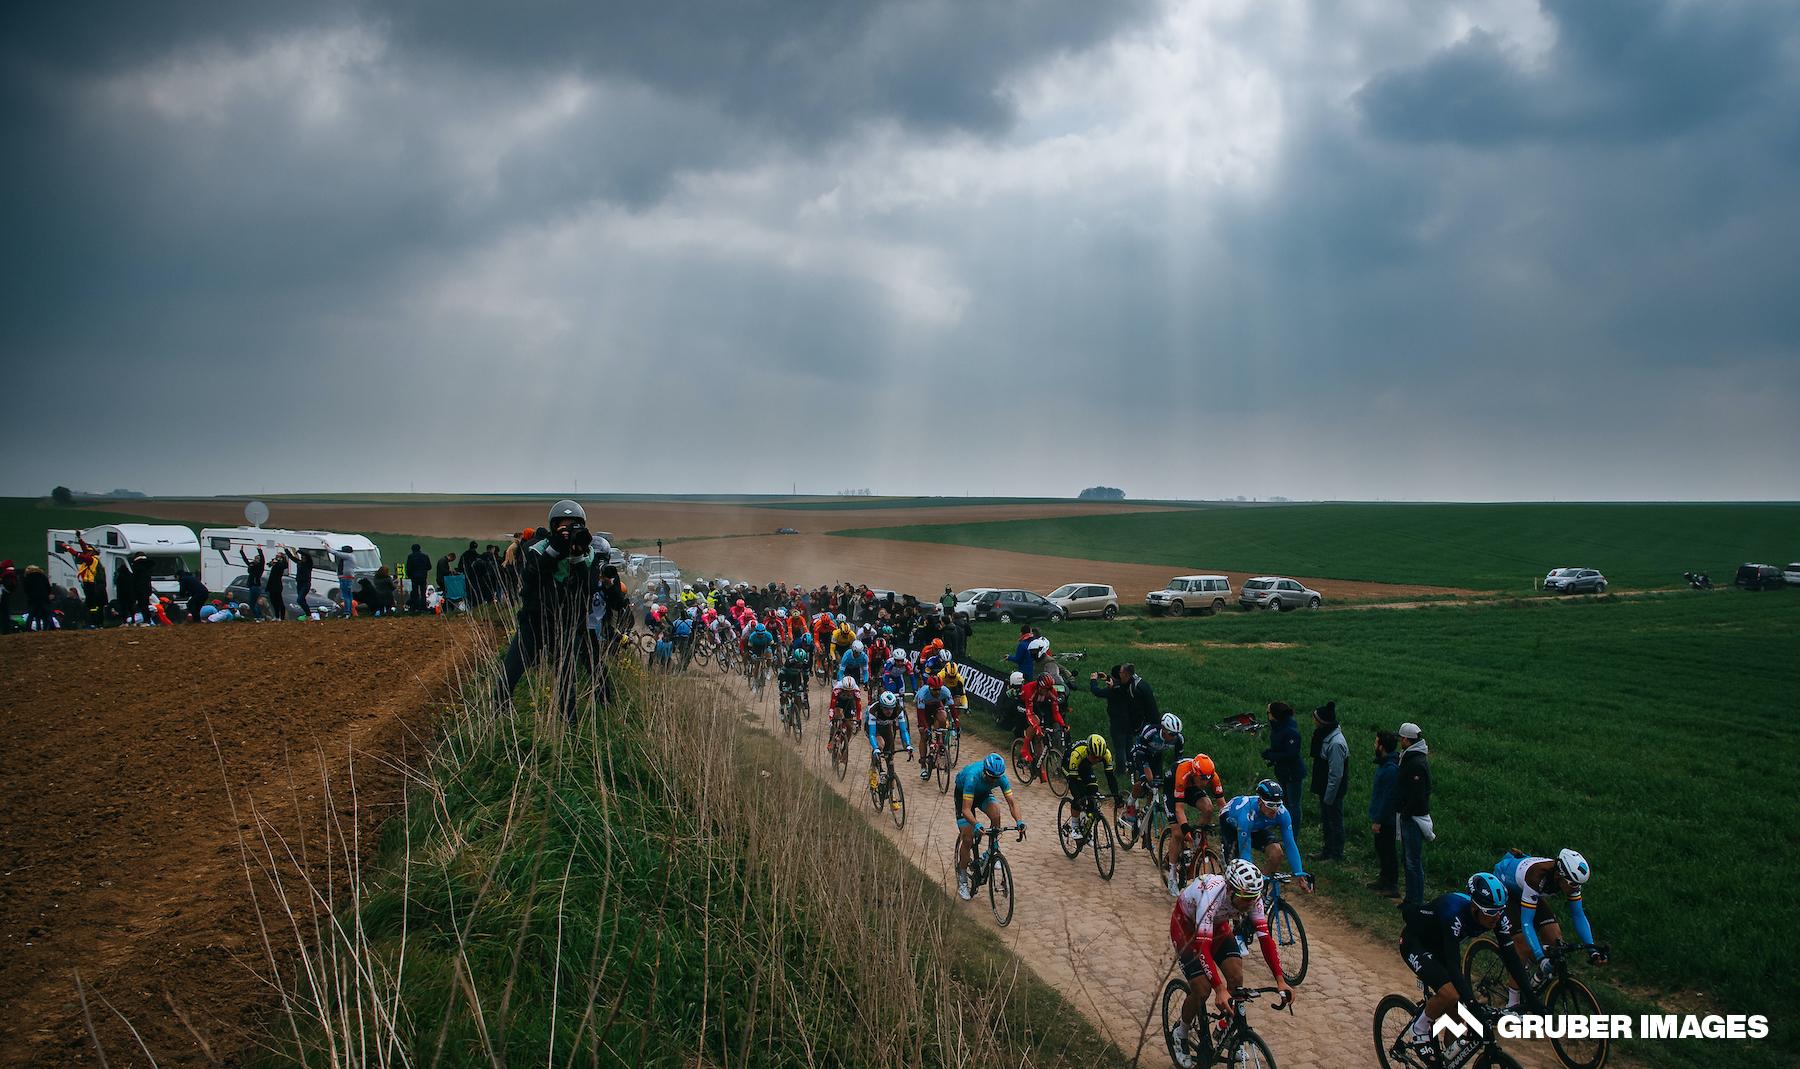 Vista previa: lo que necesita saber sobre la Paris-Roubaix masculina